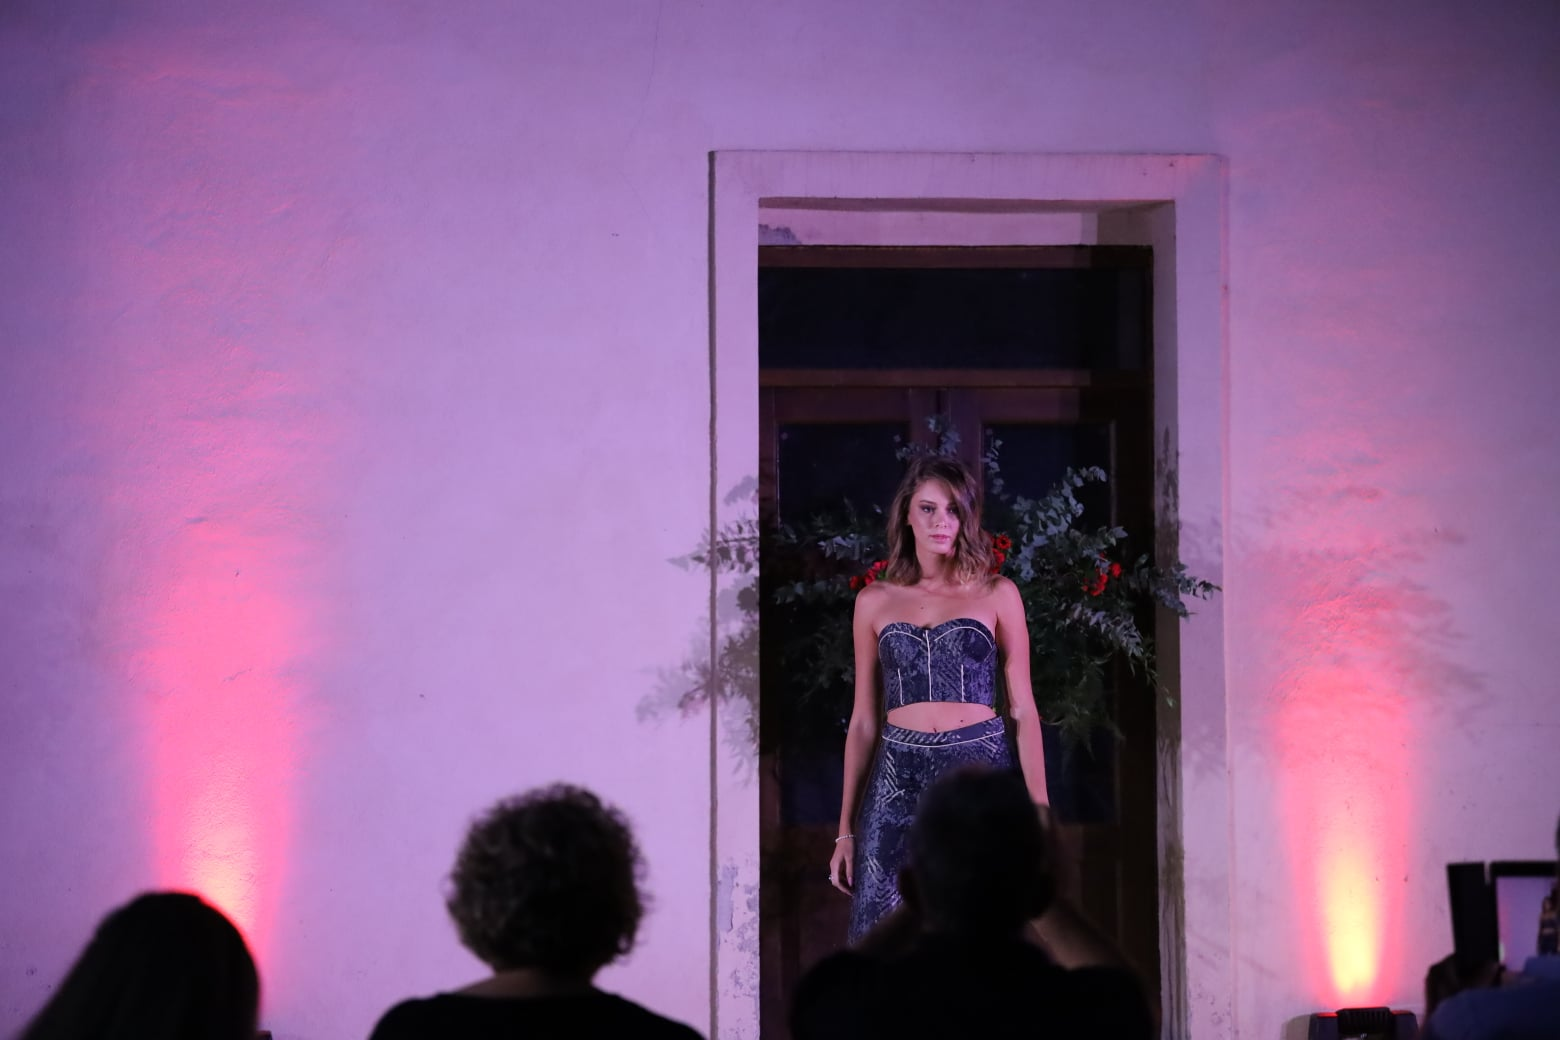 #artfabriquetalent La Calabria e la moda secondo Alessandra De Sando